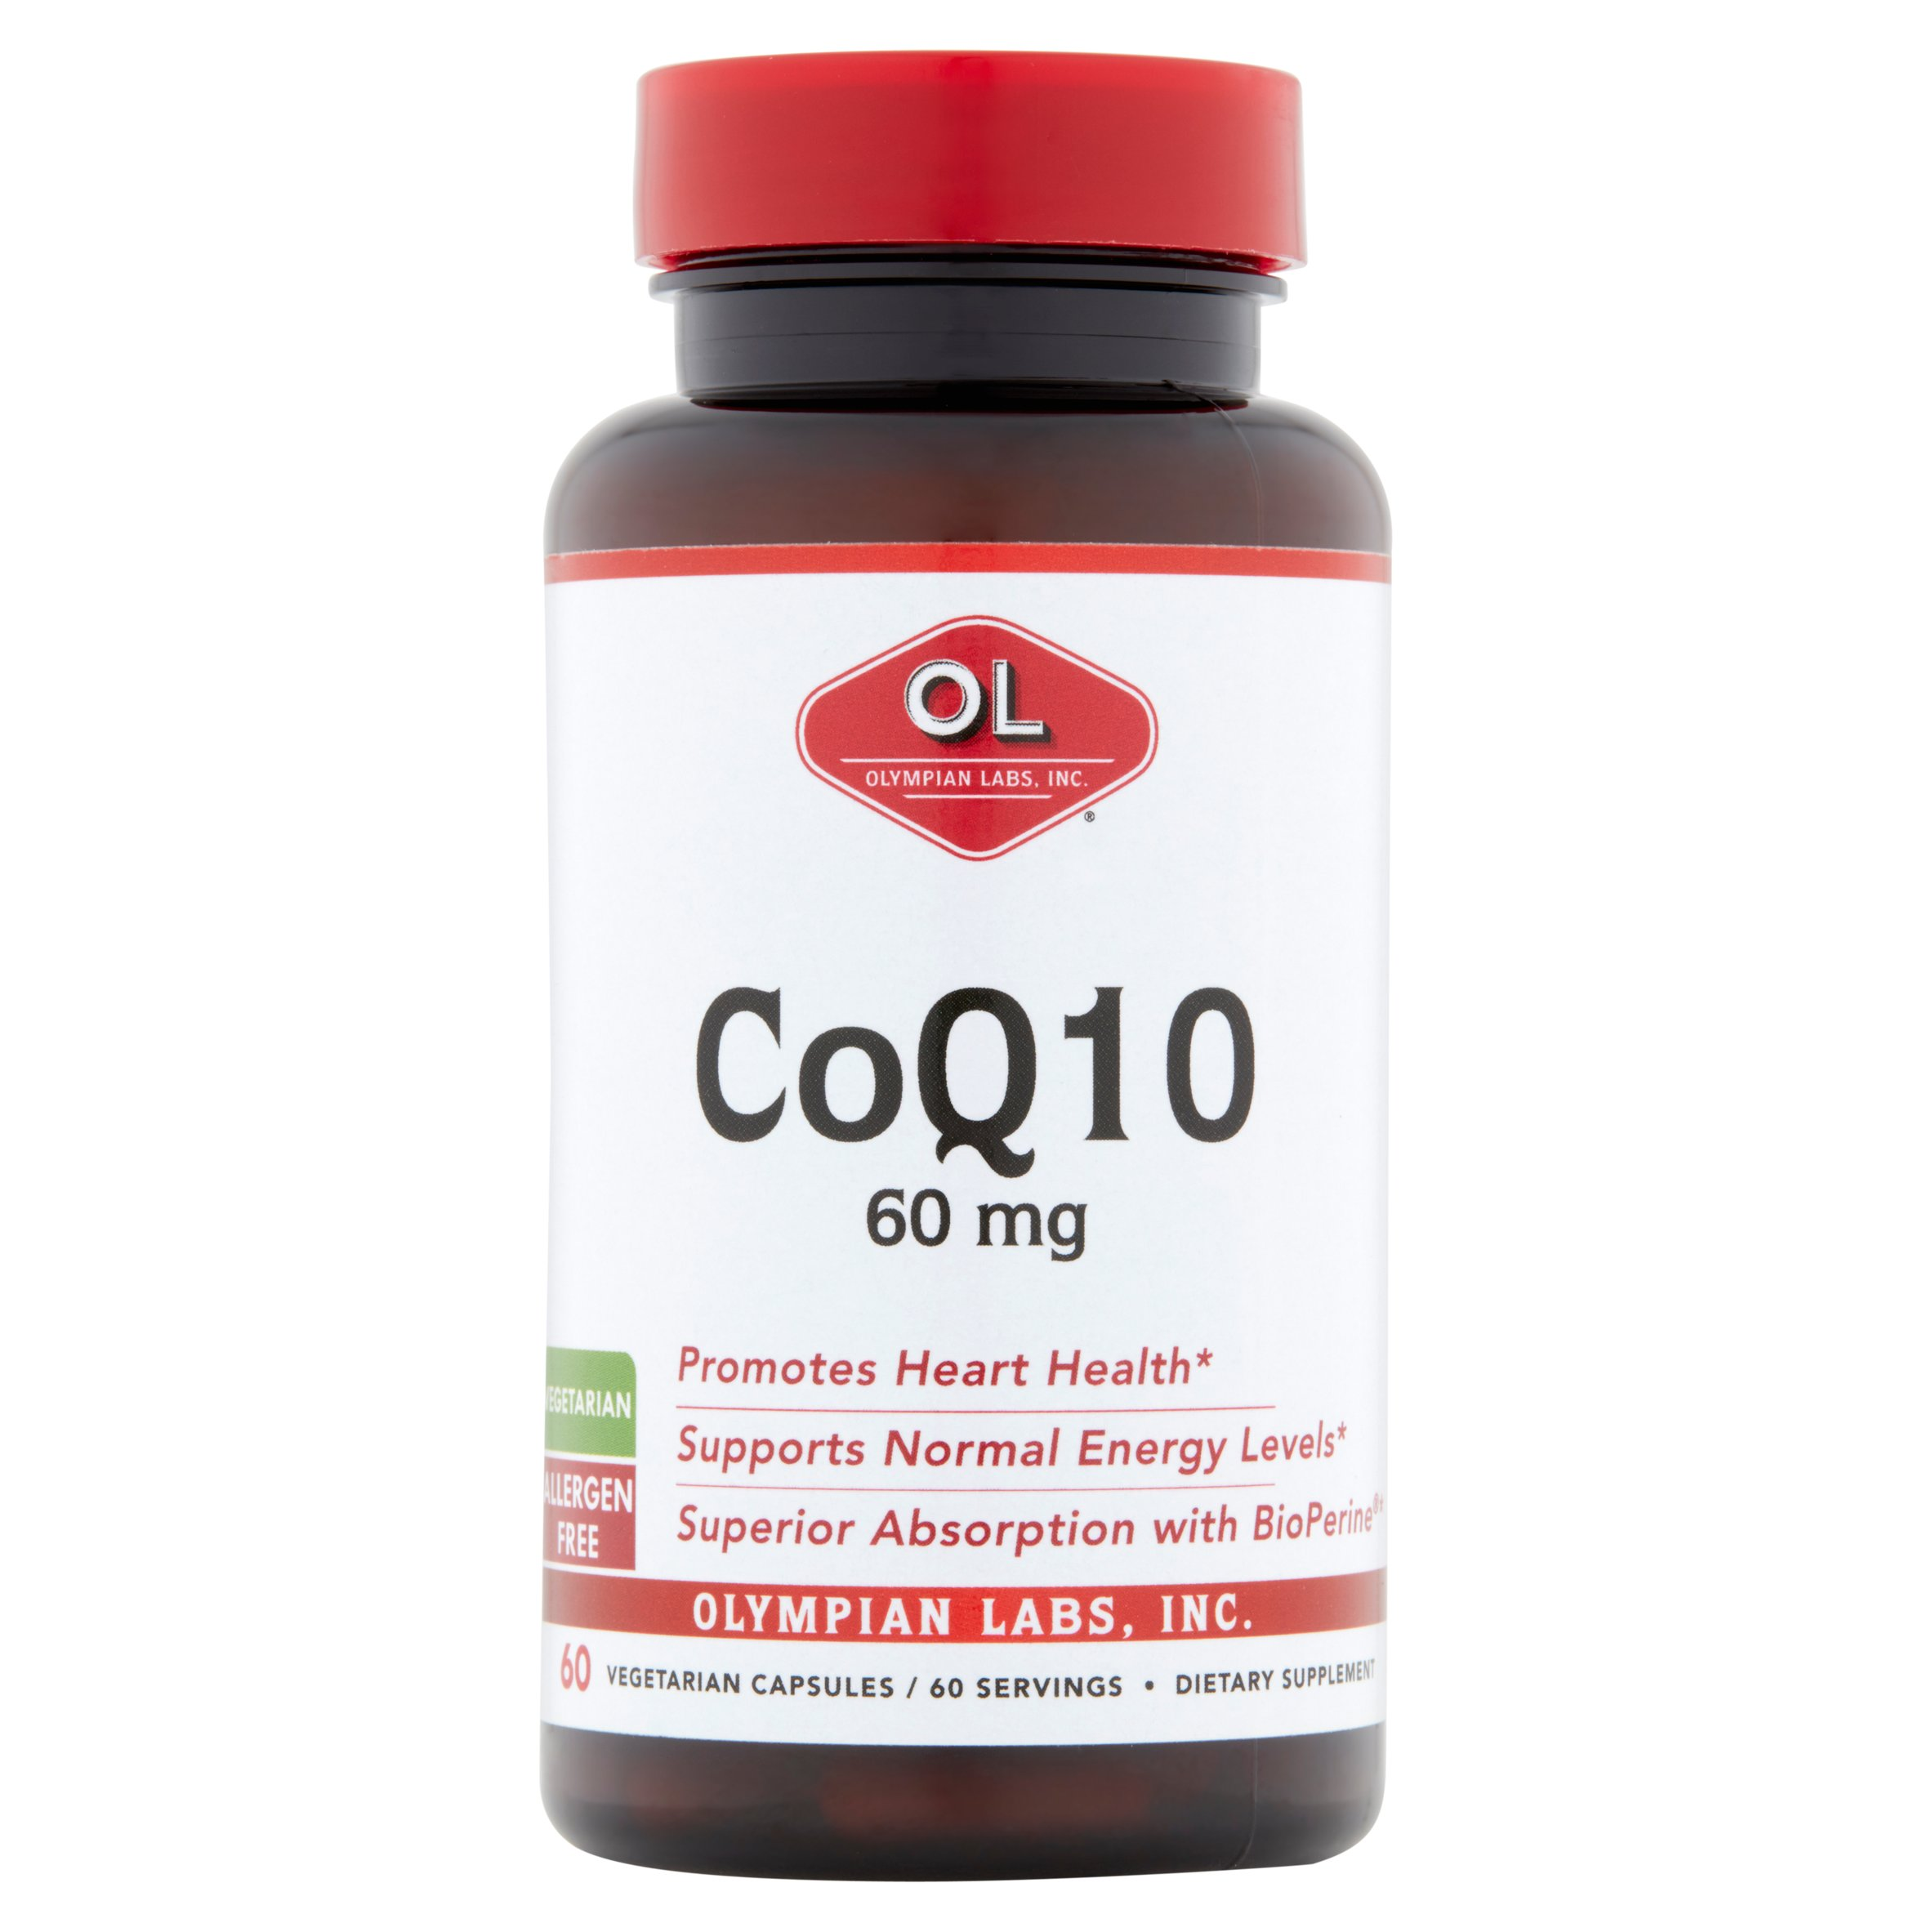 Olympian Labs Inc. CoQ10 Vegetarian Capsules, 60mg, 60 count